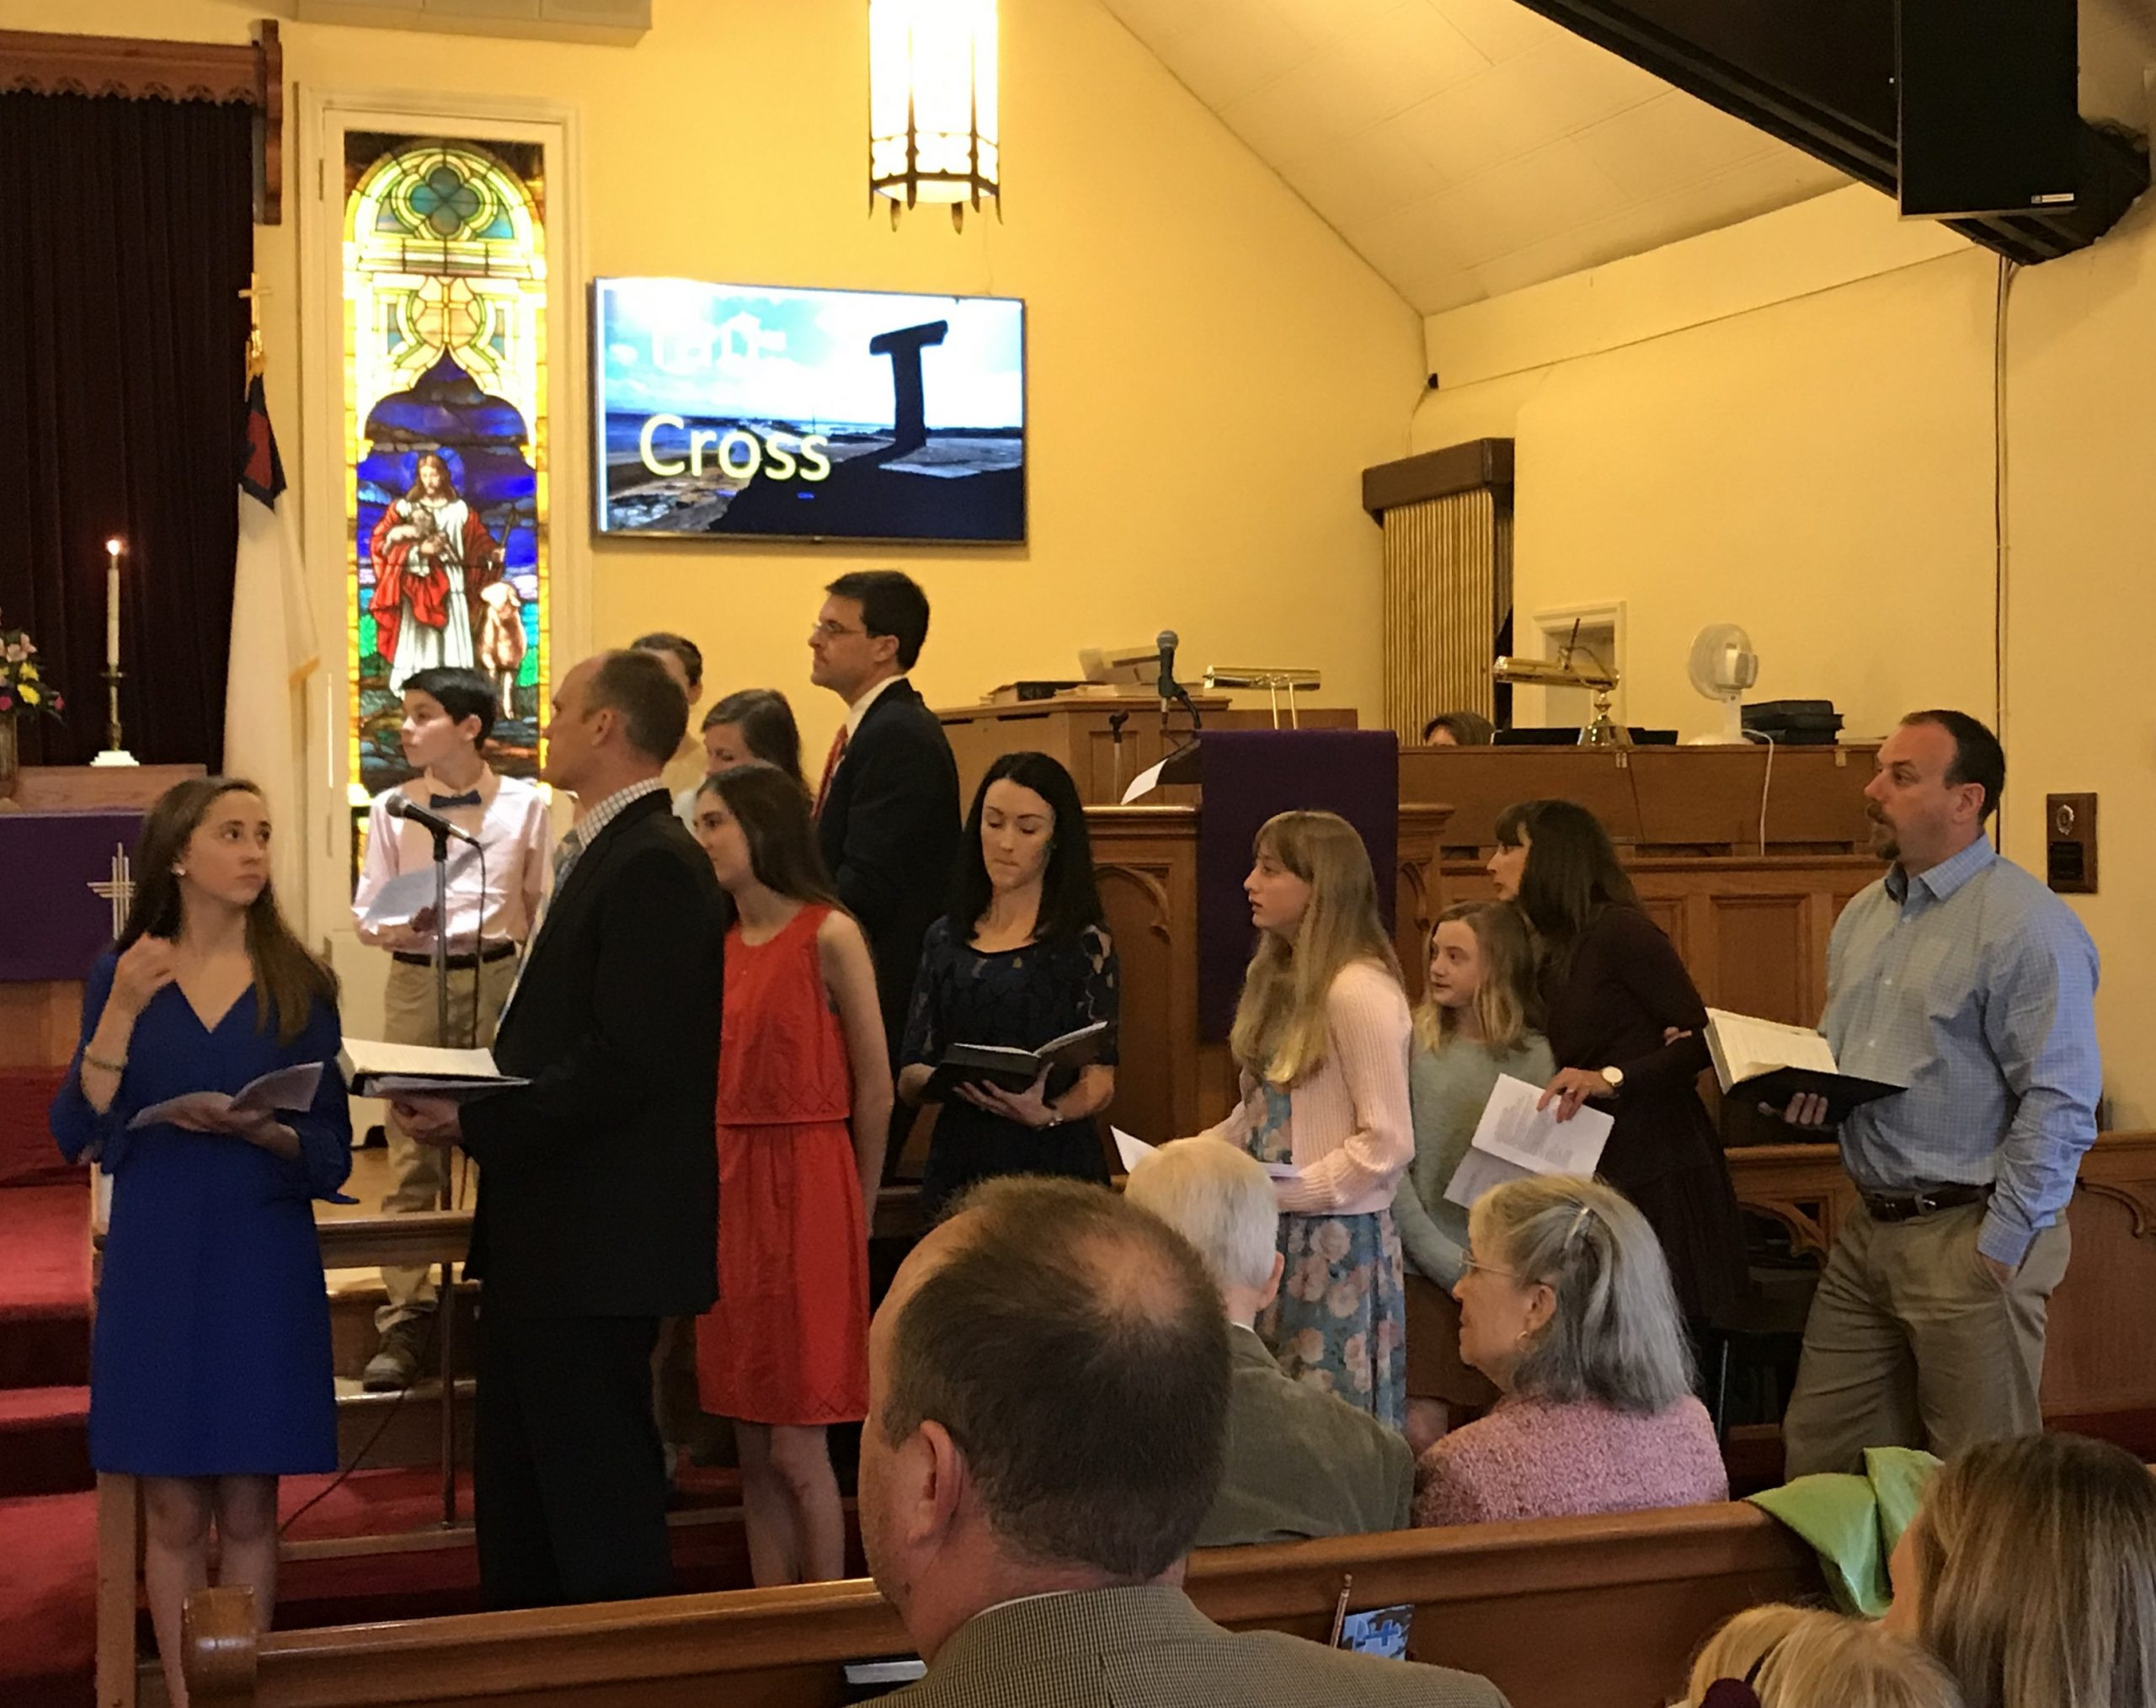 Worship   Galesville United Methodist Church  United Methodist Liturgy For Day Of Pentecost